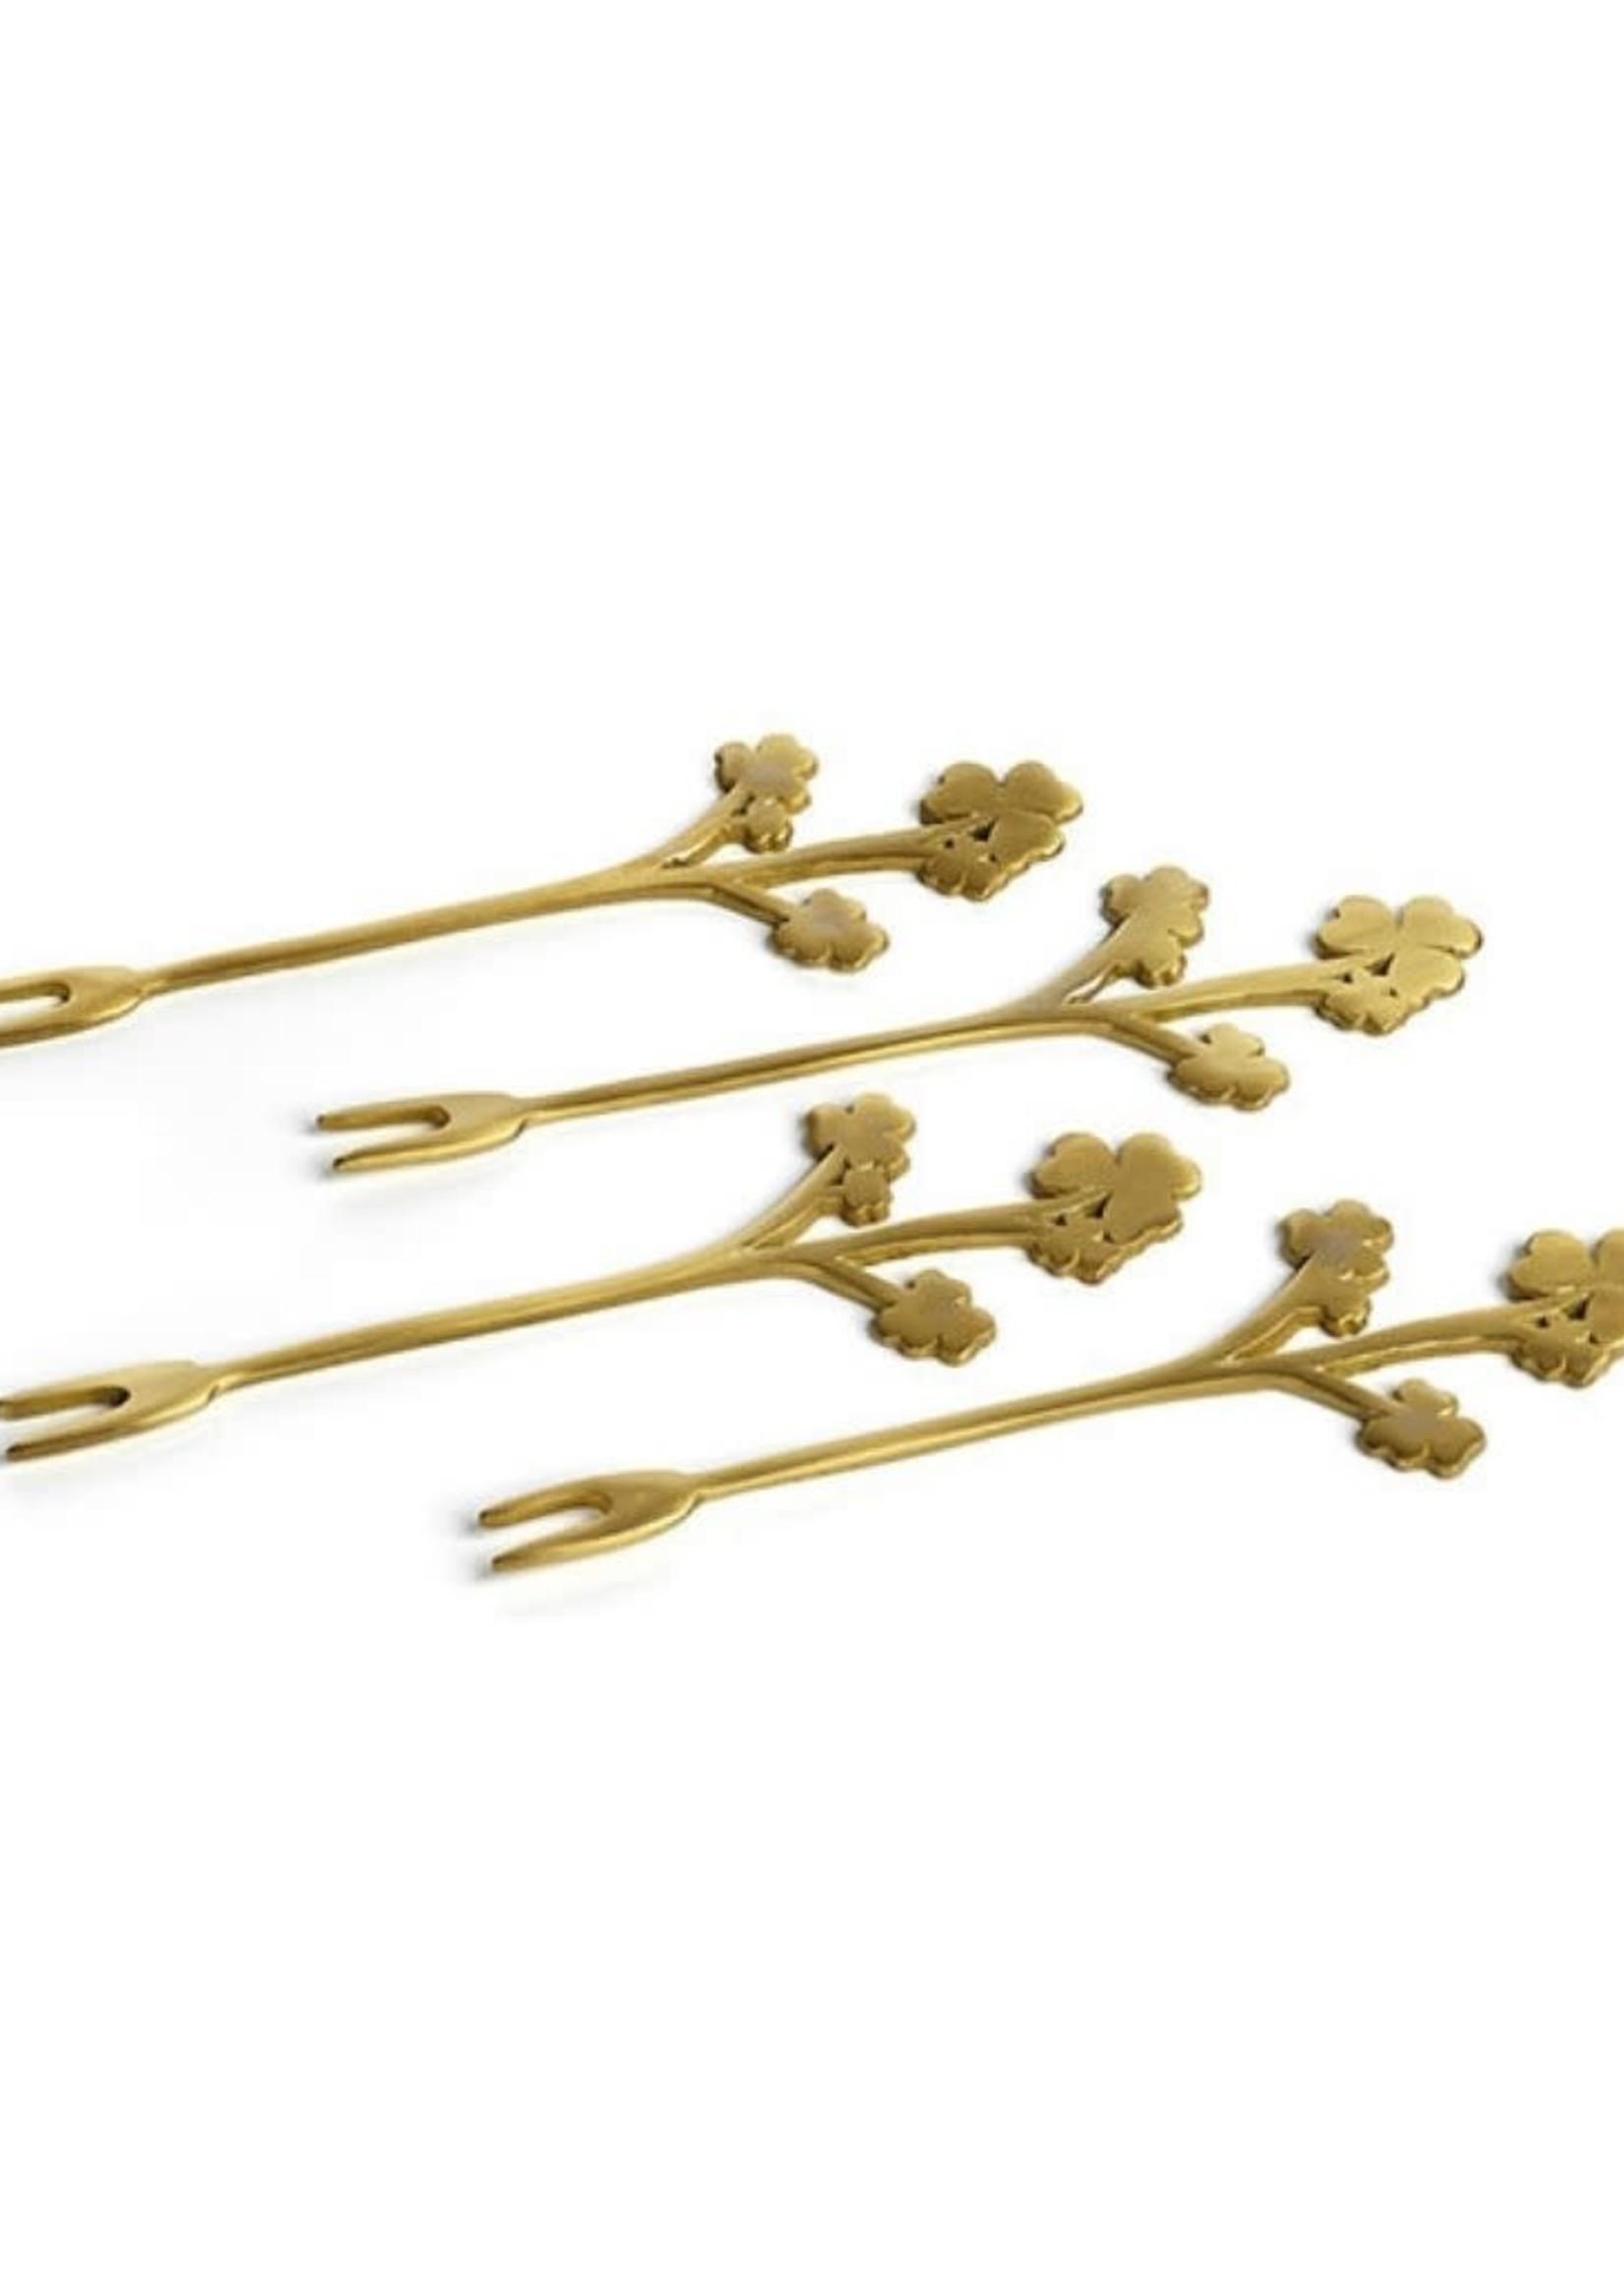 Little Flowers Cocktail Fork- Matte Gold